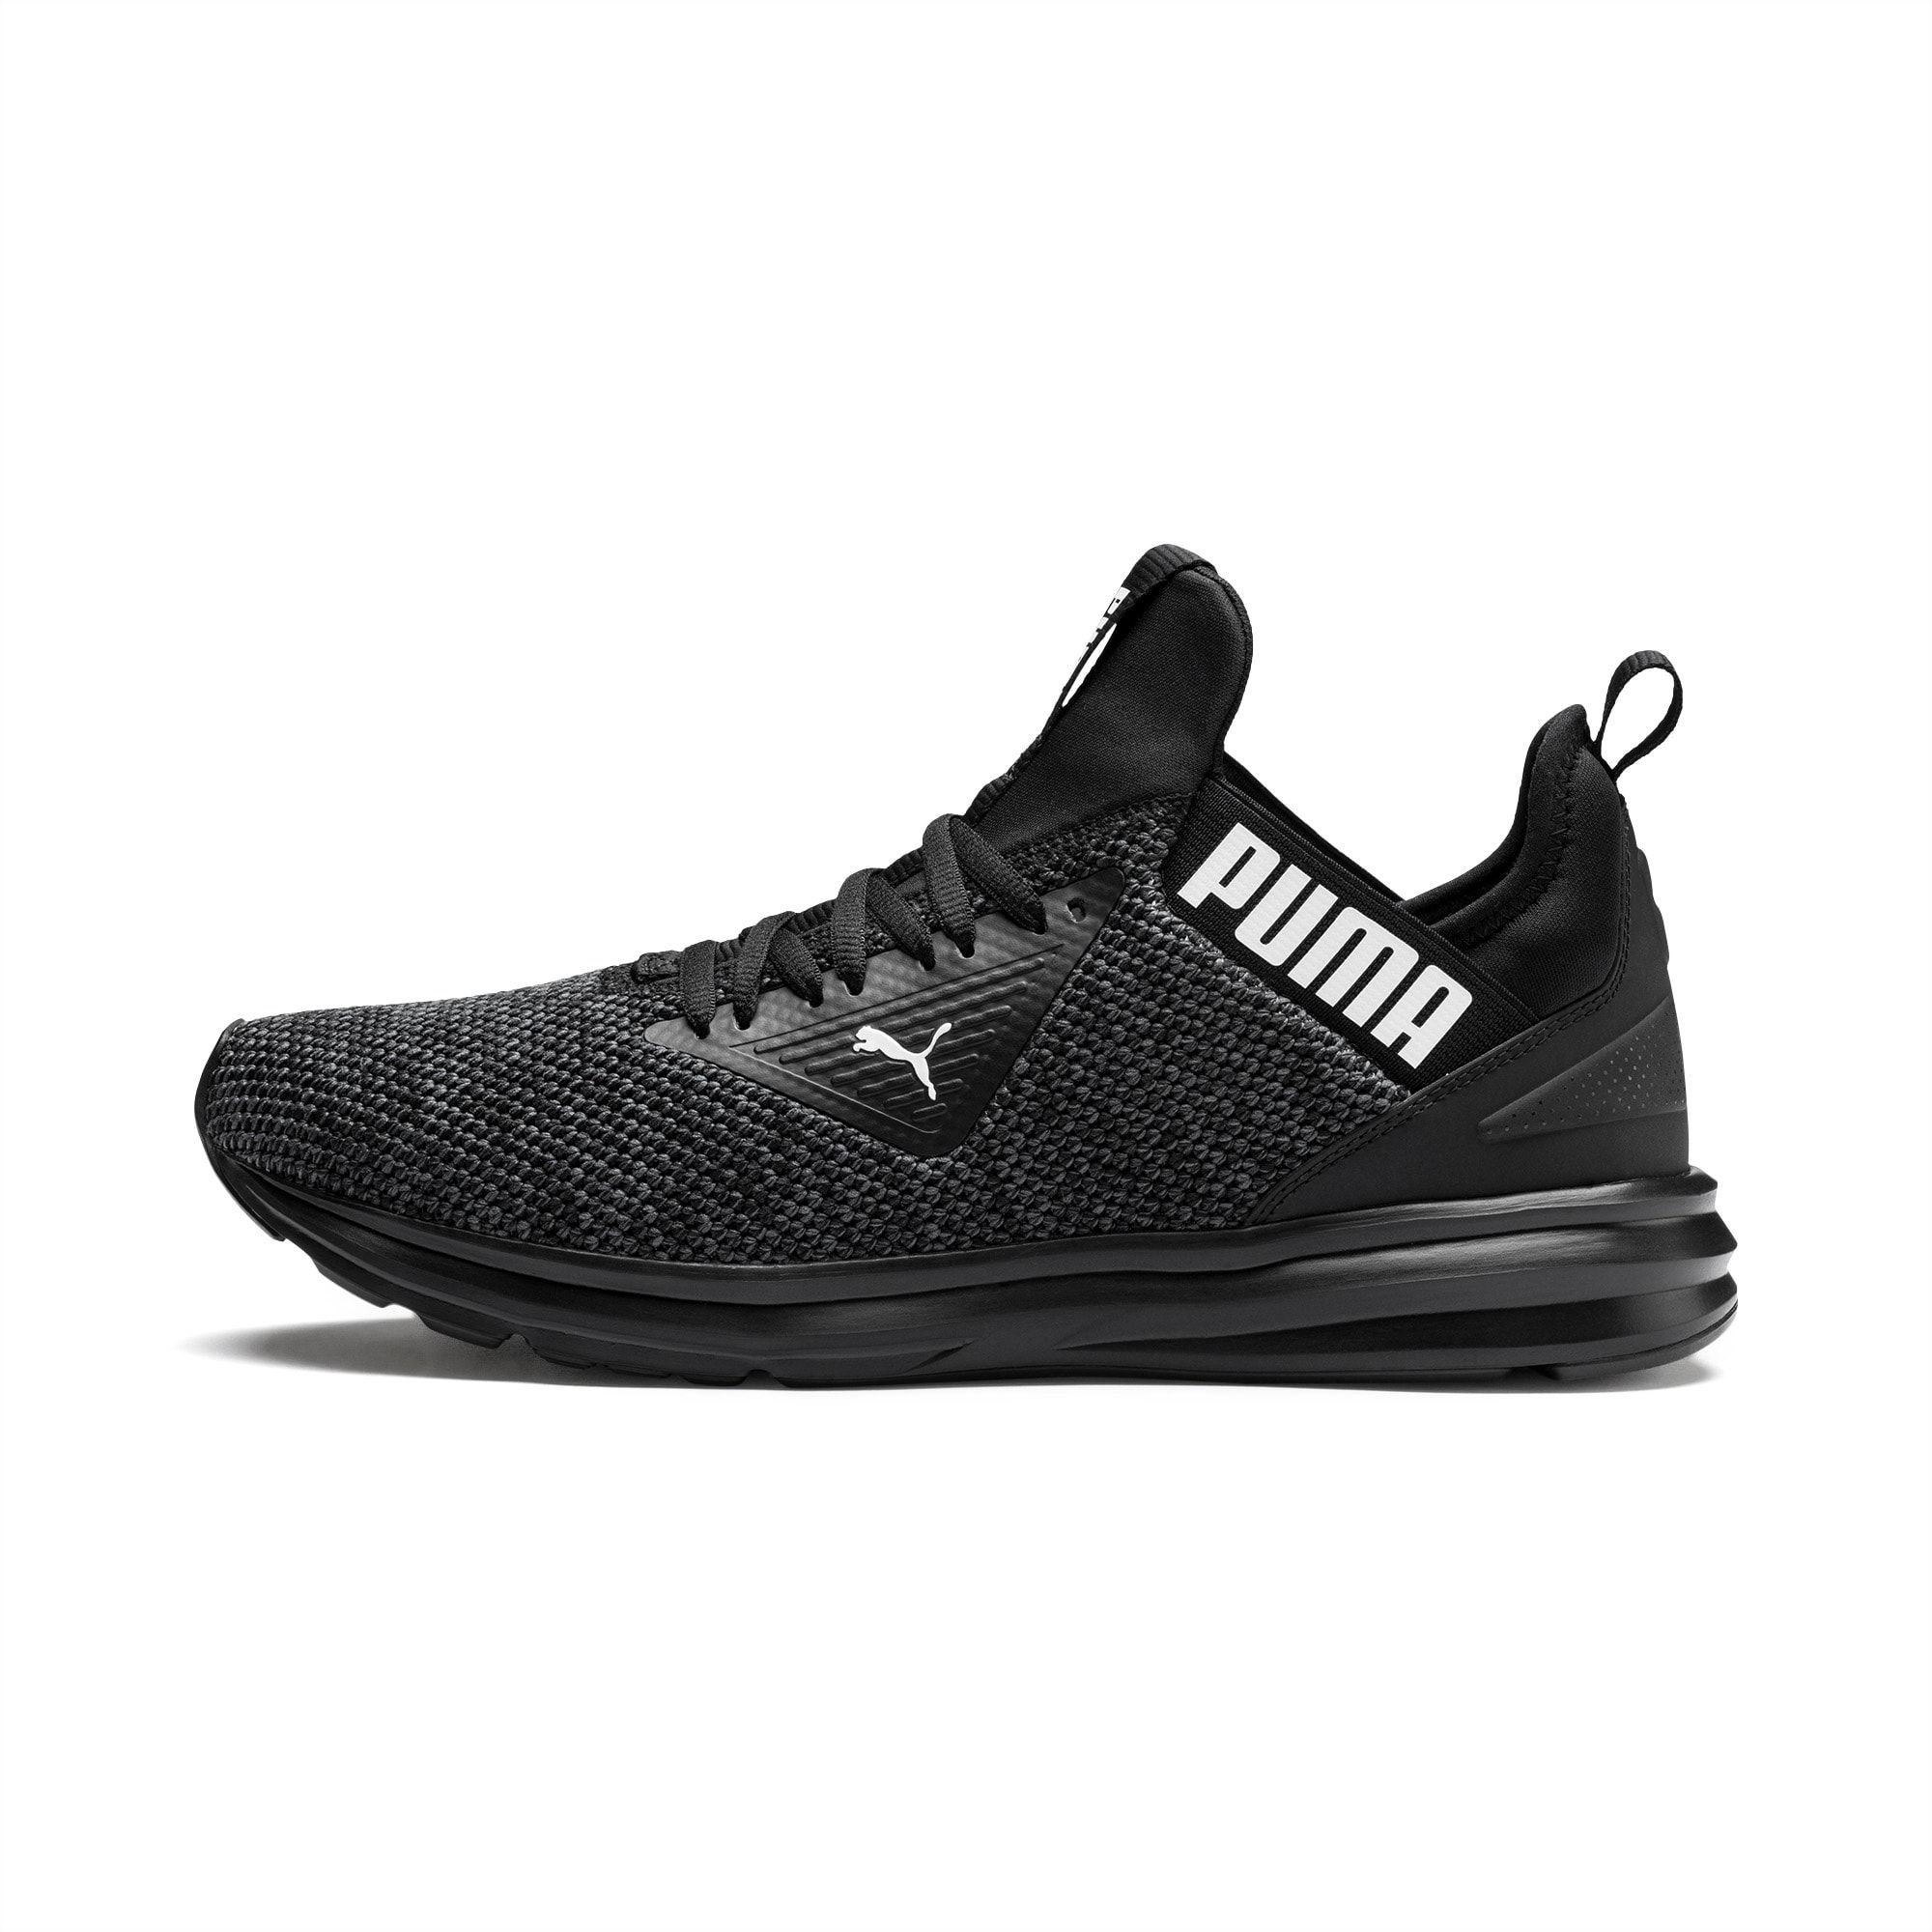 Enzo Beta Woven Men's Running Shoes   Puma Black-Asphalt   PUMA ...